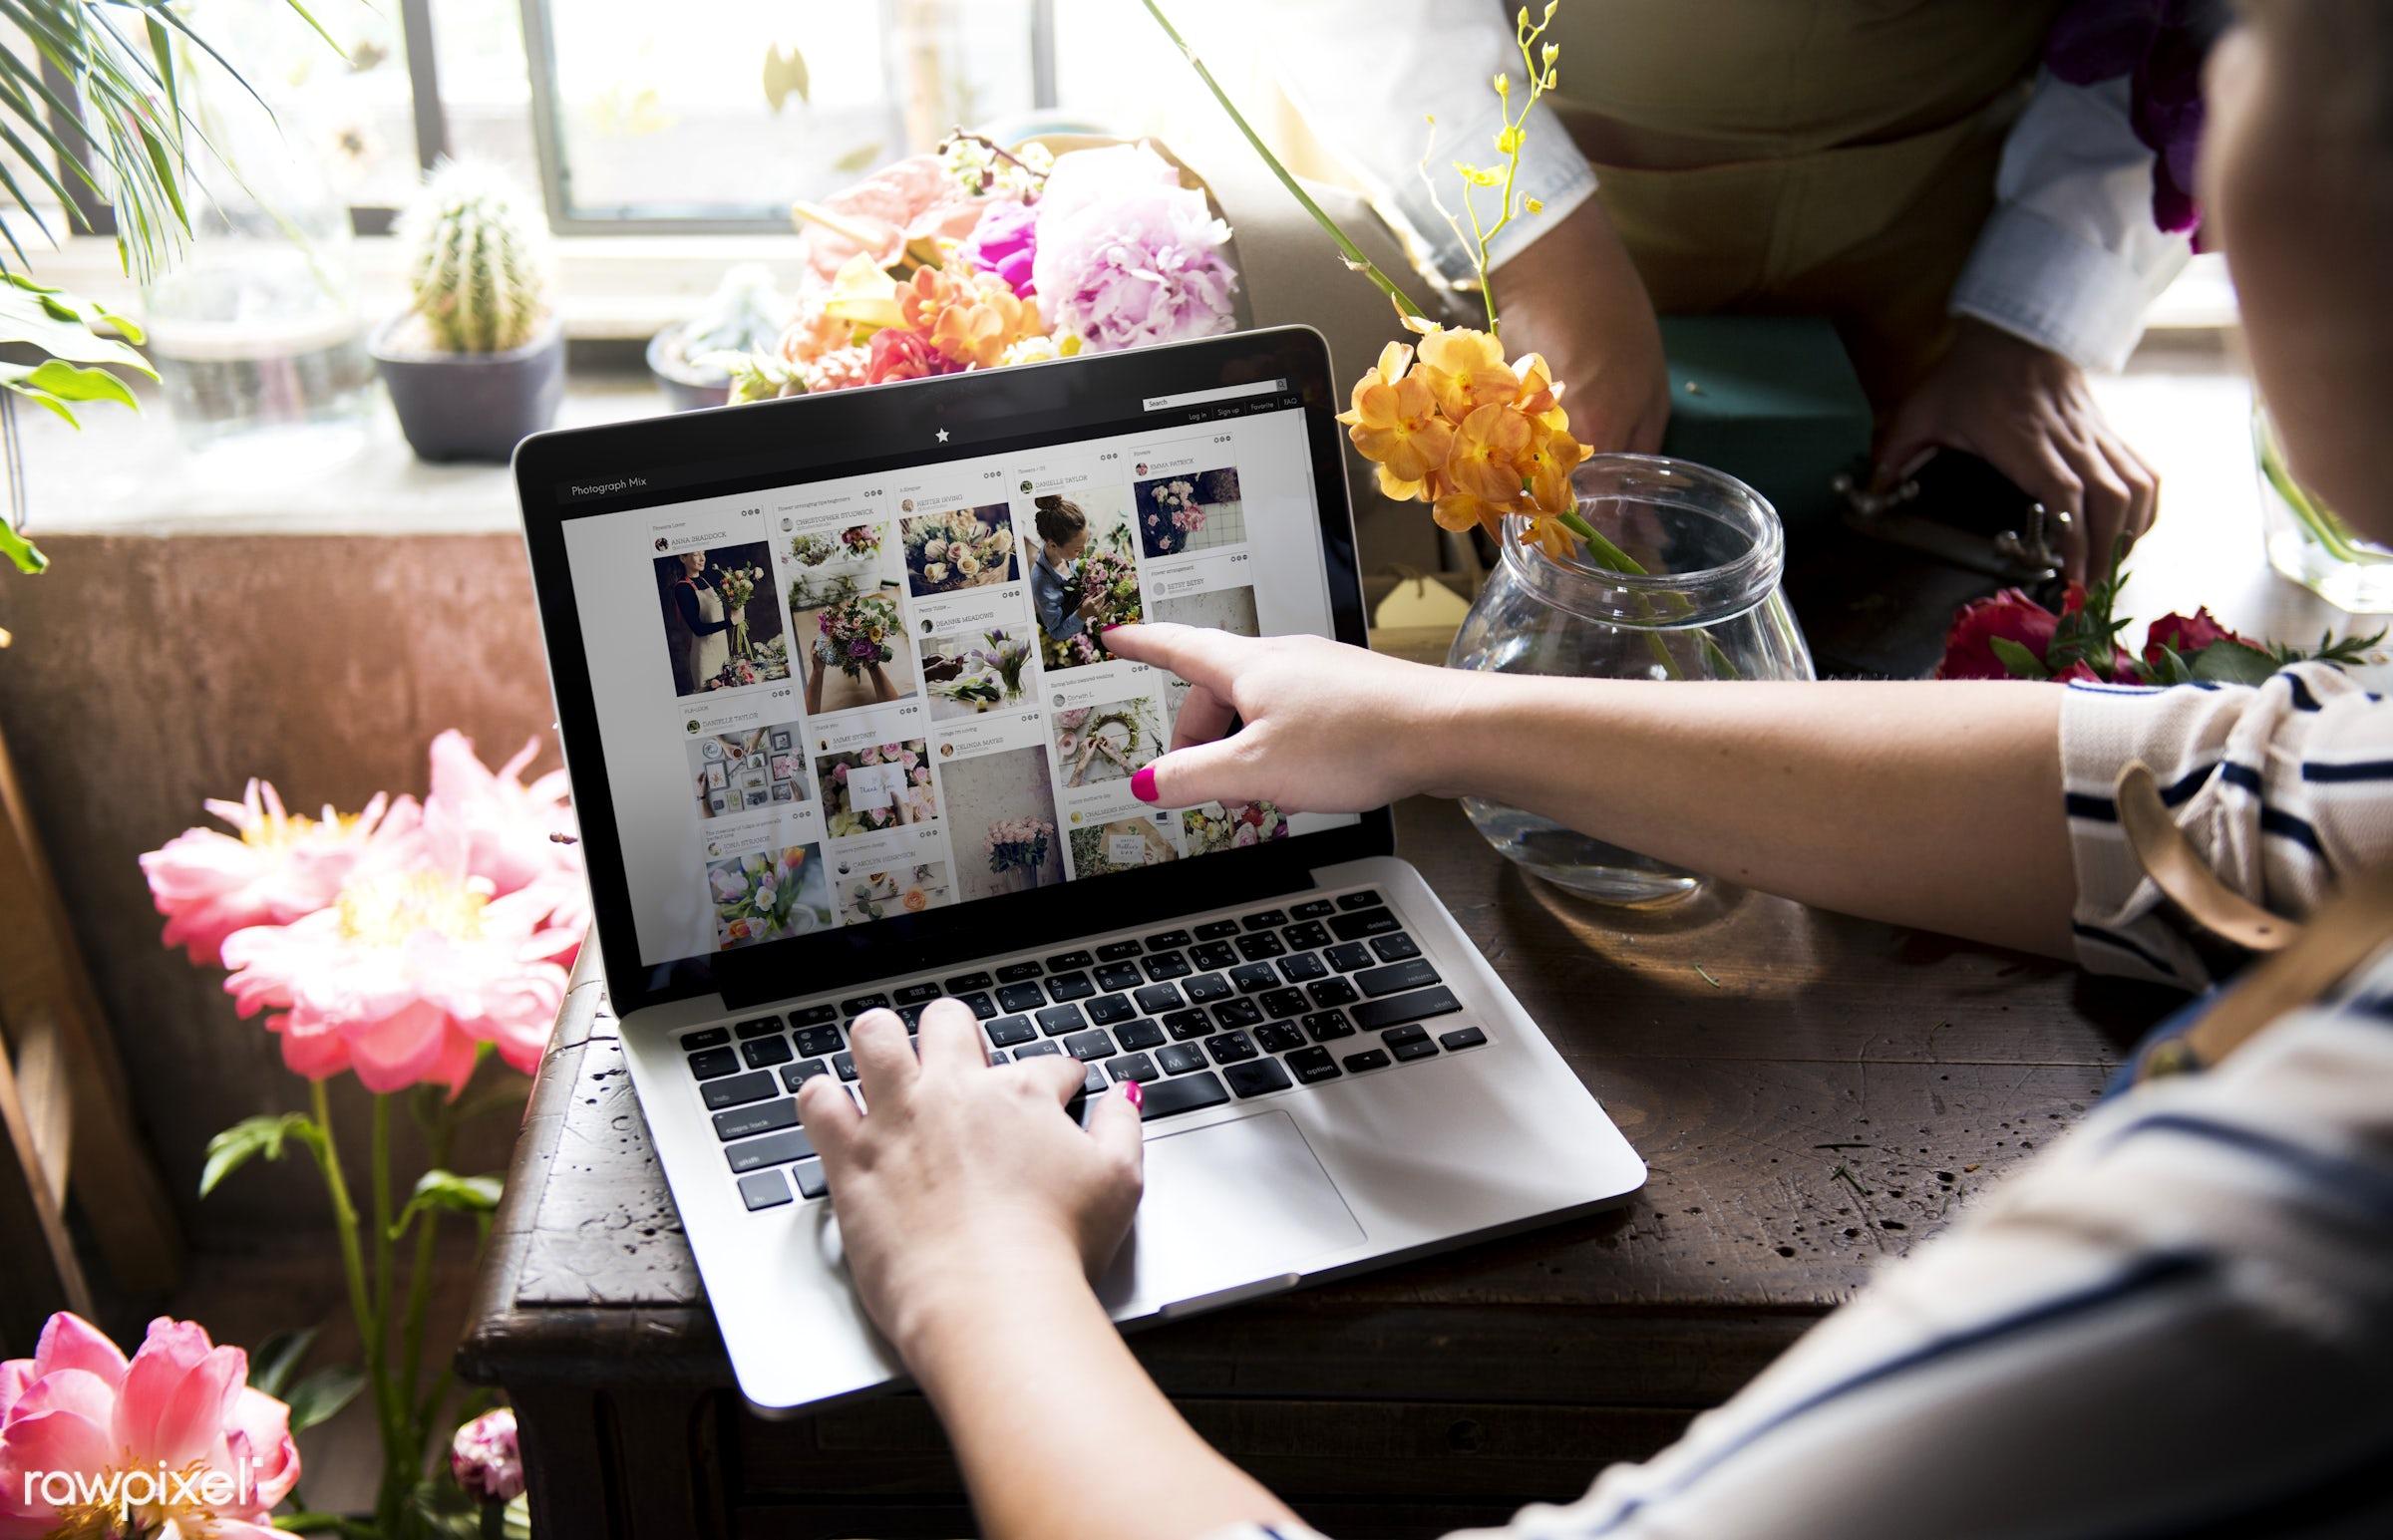 plant, person, technology, fresh, laptop, couple, partner, flower, flora, decoration, refreshment, group of people, leisure...